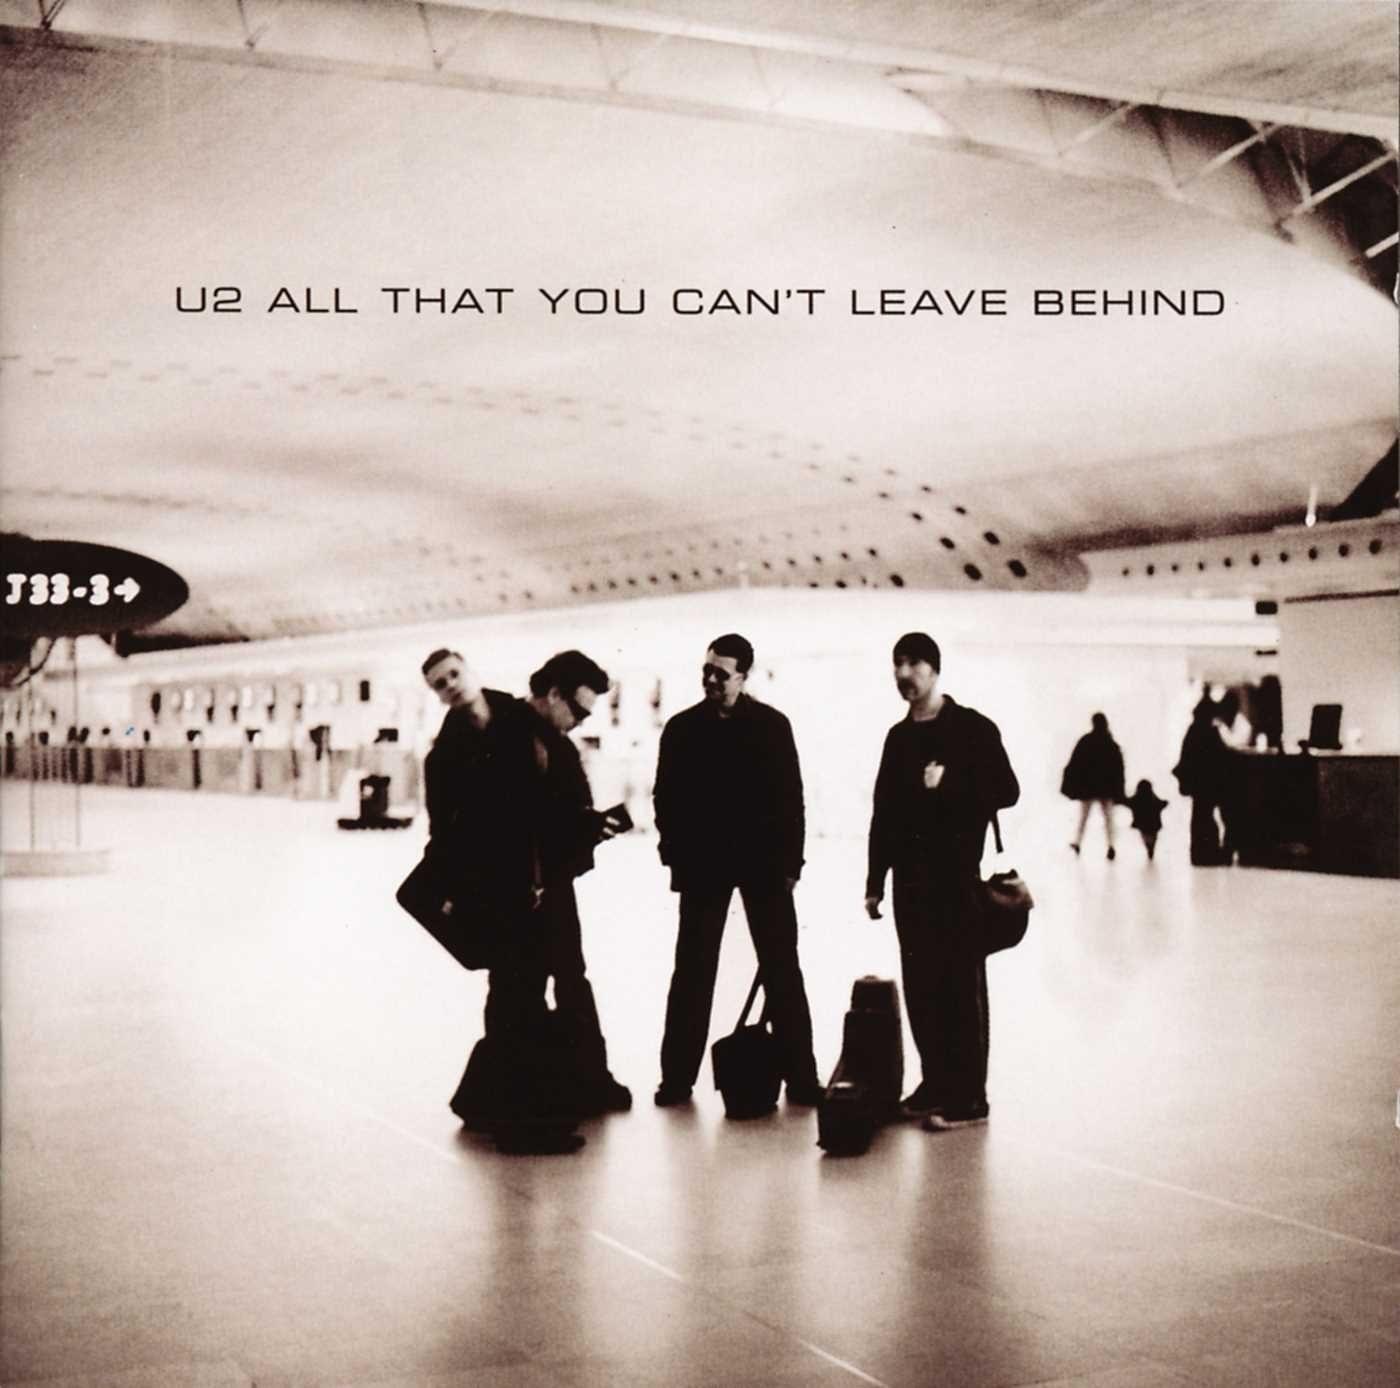 U2 in the airport.